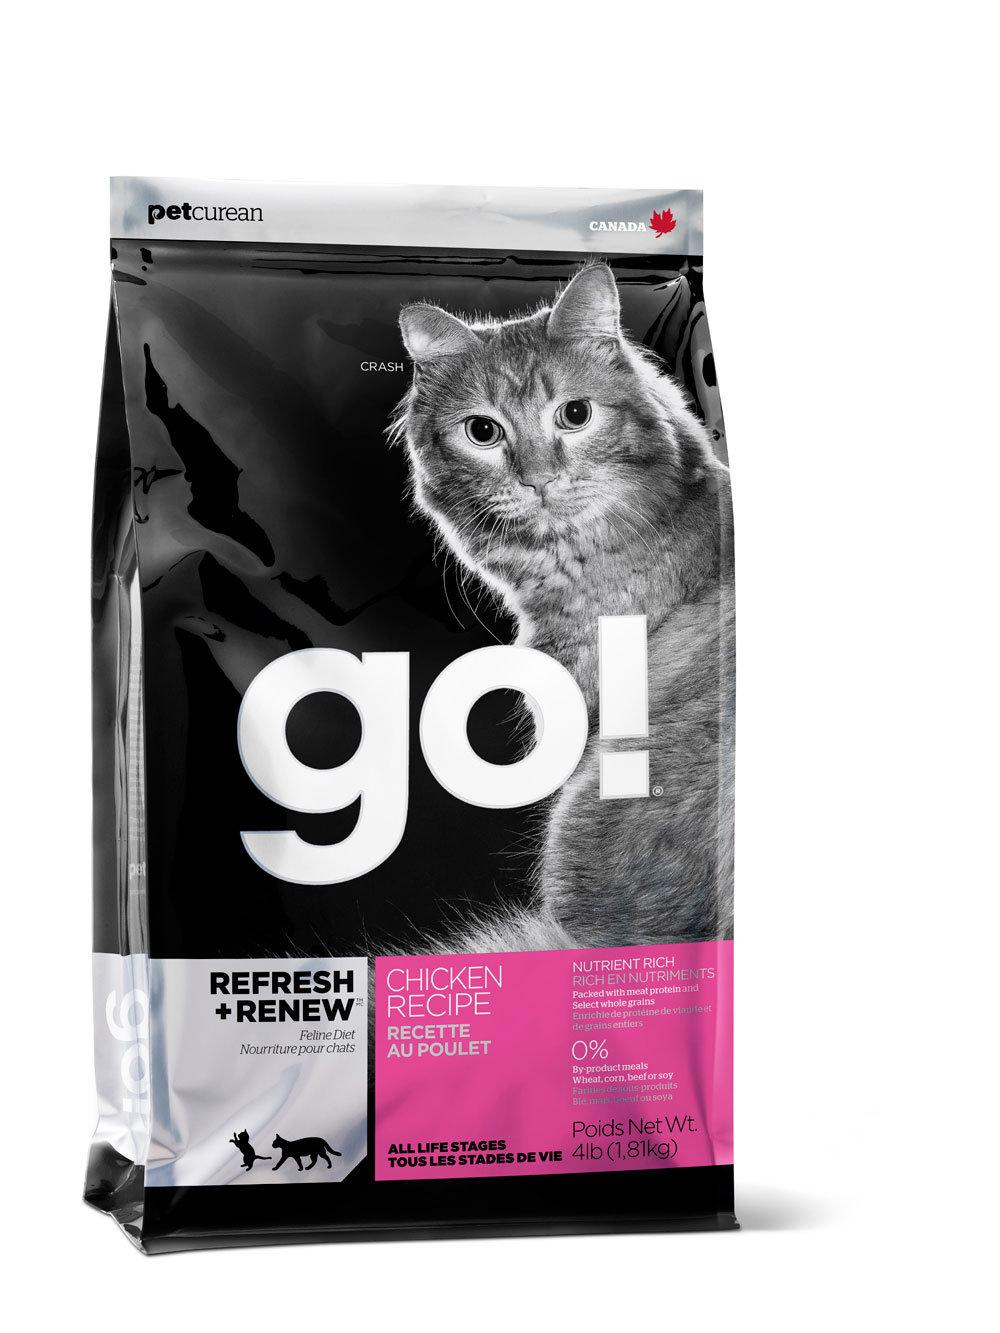 Сухой корм для кошек и котят GO! Natural цельная курица, фрукты, овощи 7,26 кг